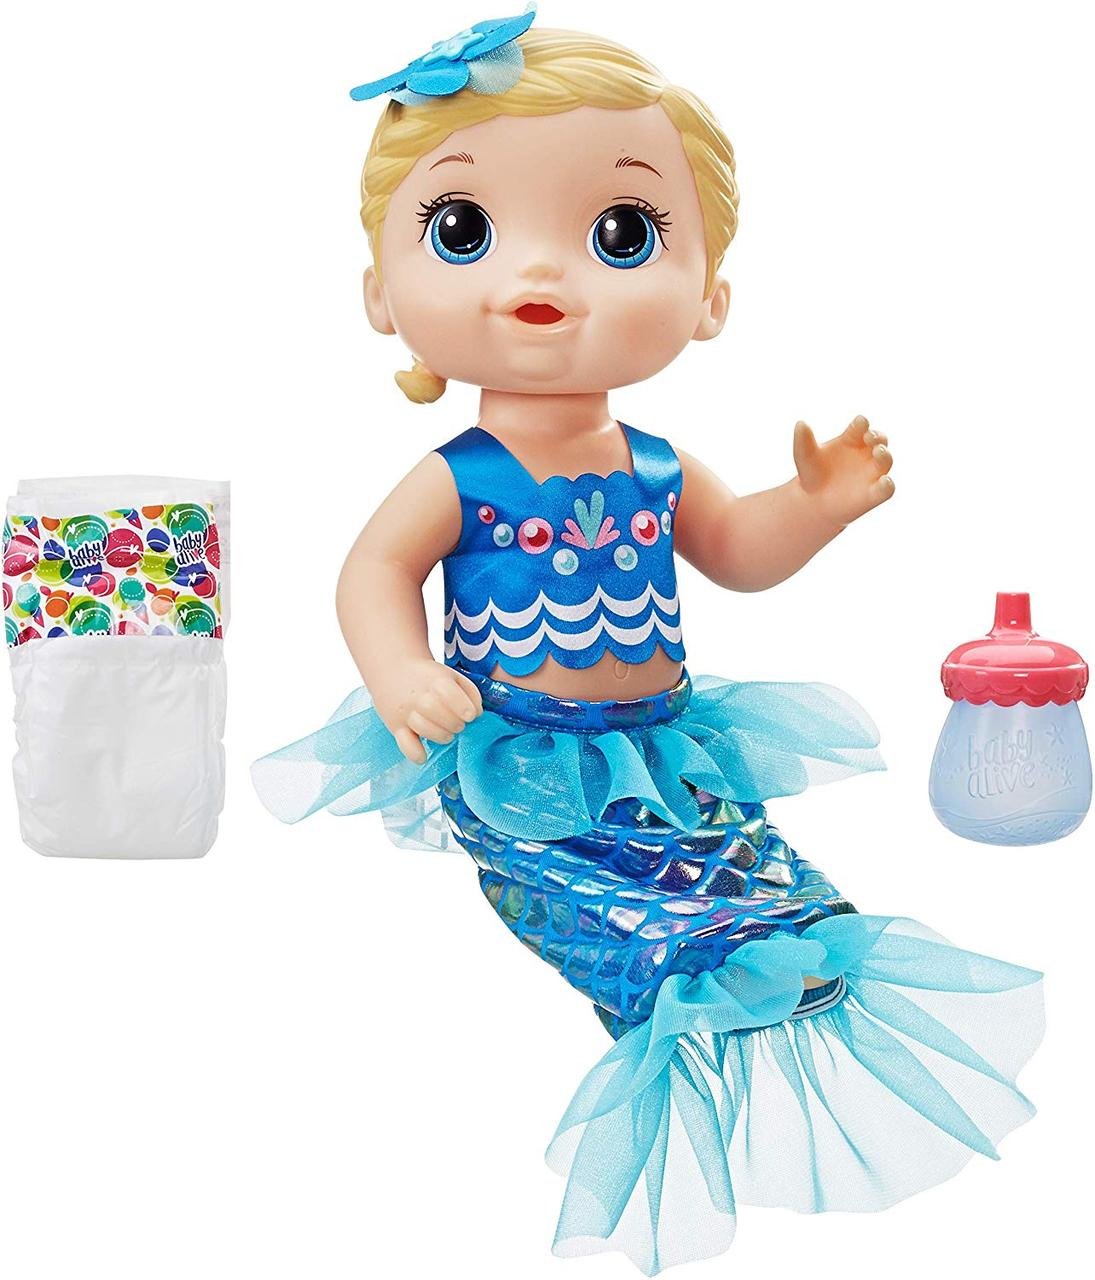 Кукла Мерцающая Русалочка Беби Элайв Baby Alive Shimmer Splash Mermaid